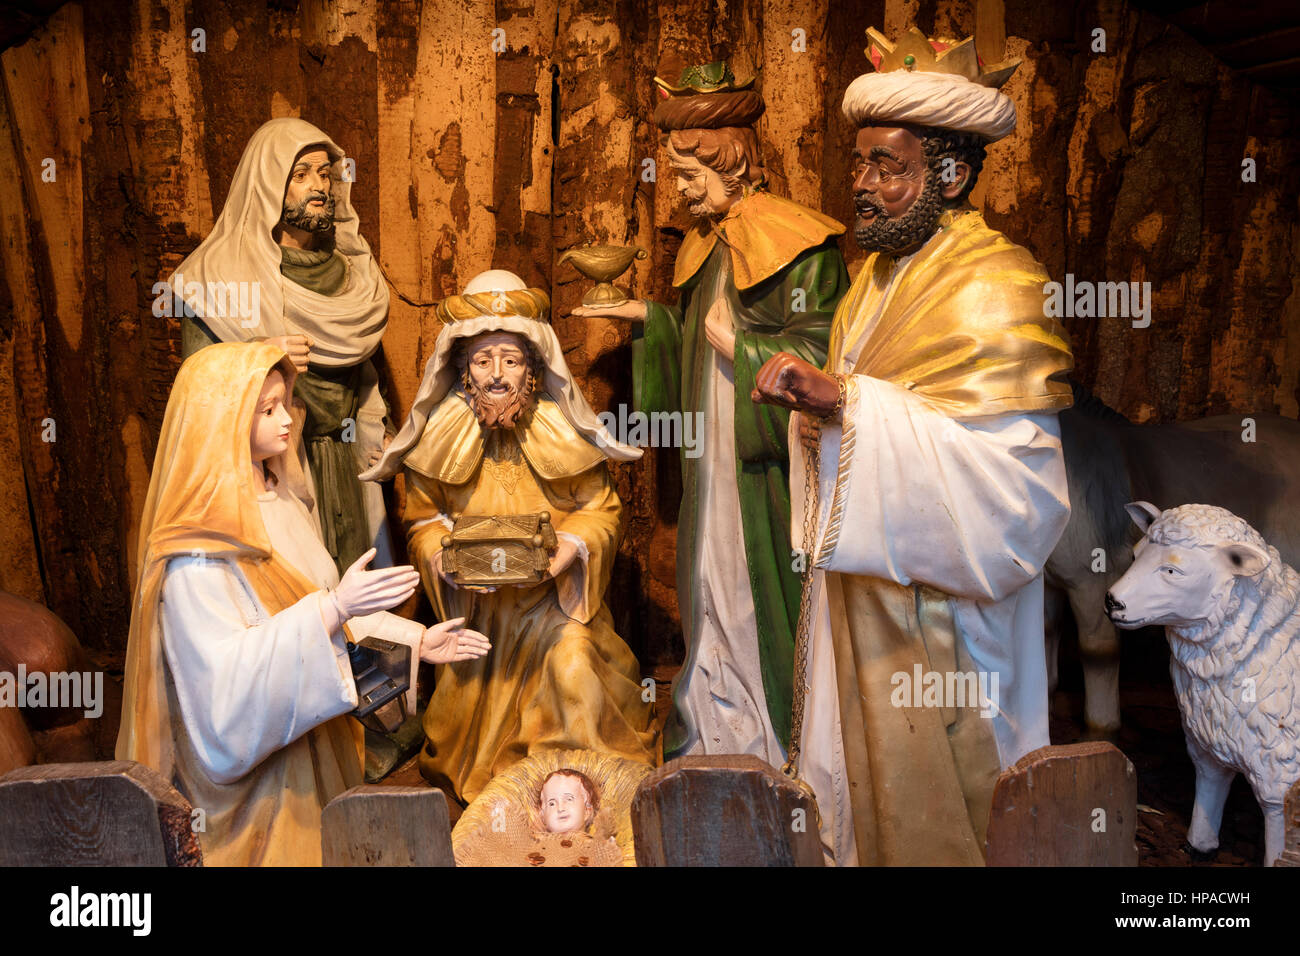 Nativity scene figures, Holy Family and Holy Three Kings of the nativity scene, Christmas Market, Bremen, Germany Stock Photo